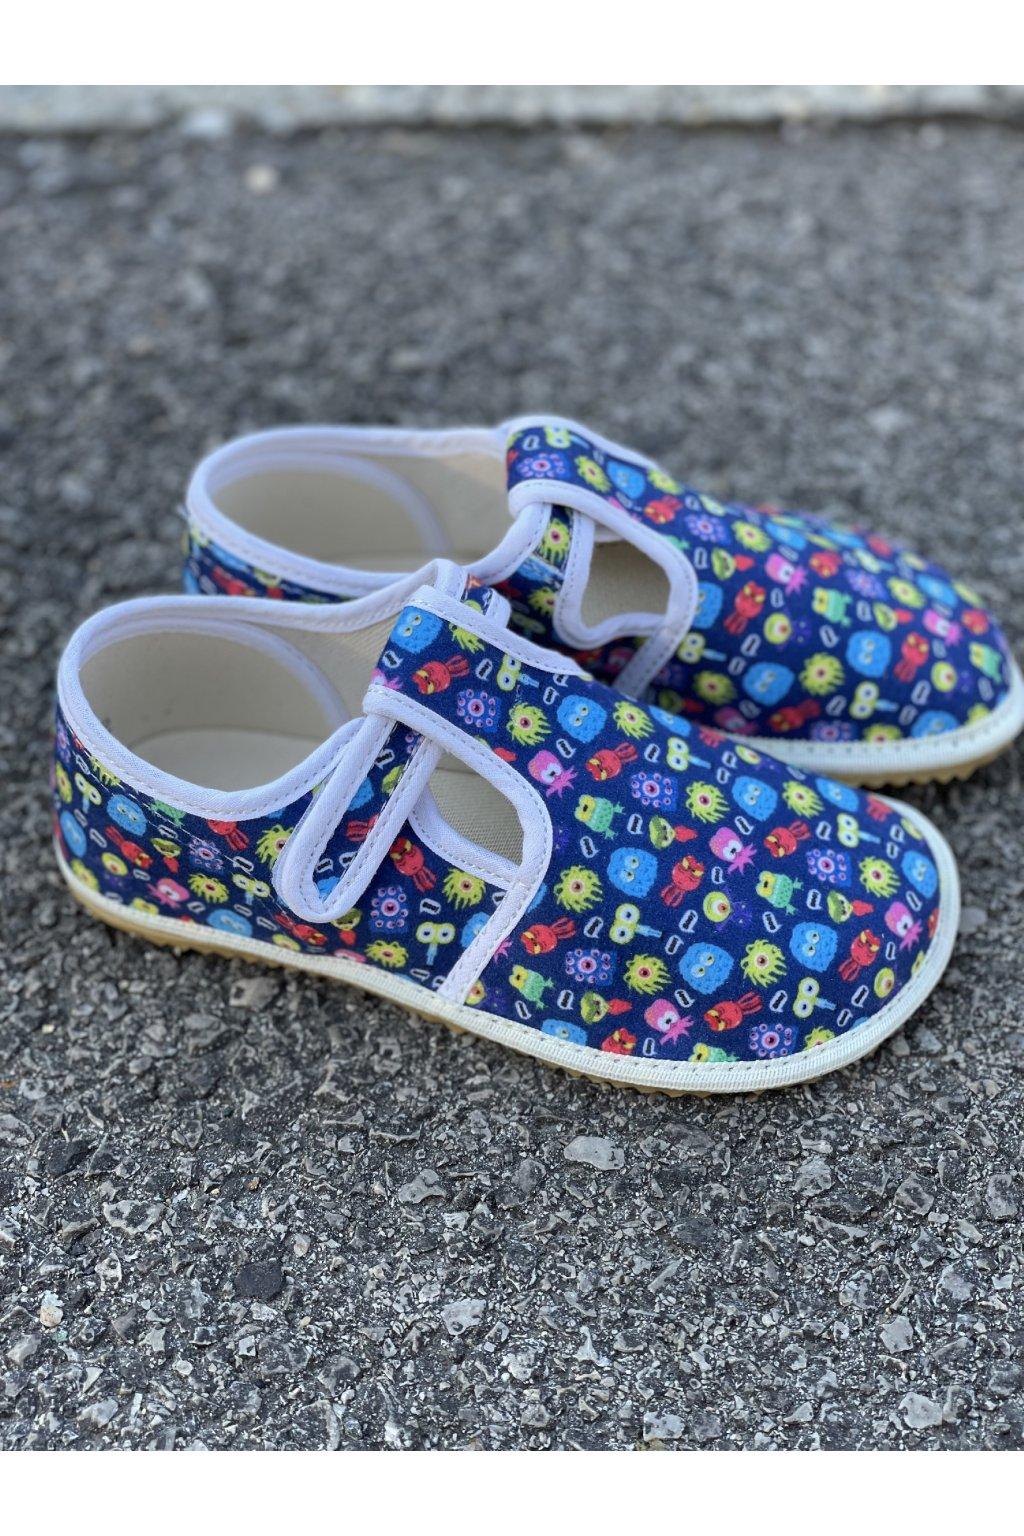 Jonap papučky Modre bakterie